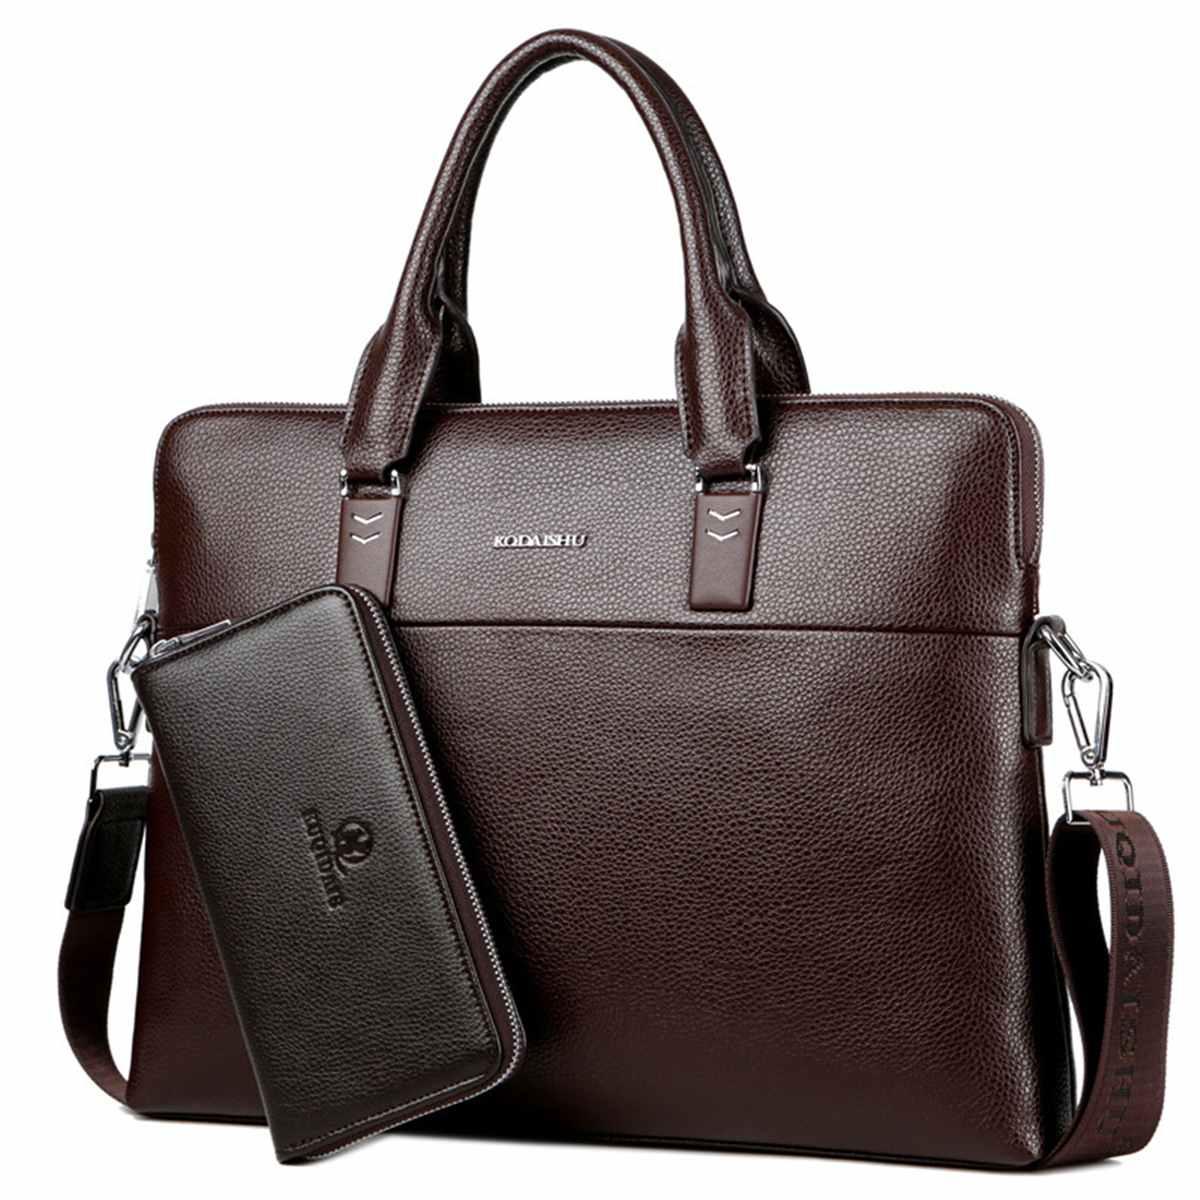 2PCS Fashion Men's Business PU Leather Briefcase Bag With Purse Handbag Laptop Shoulder Bags Messenger Bags Bolso Hombre Maleta